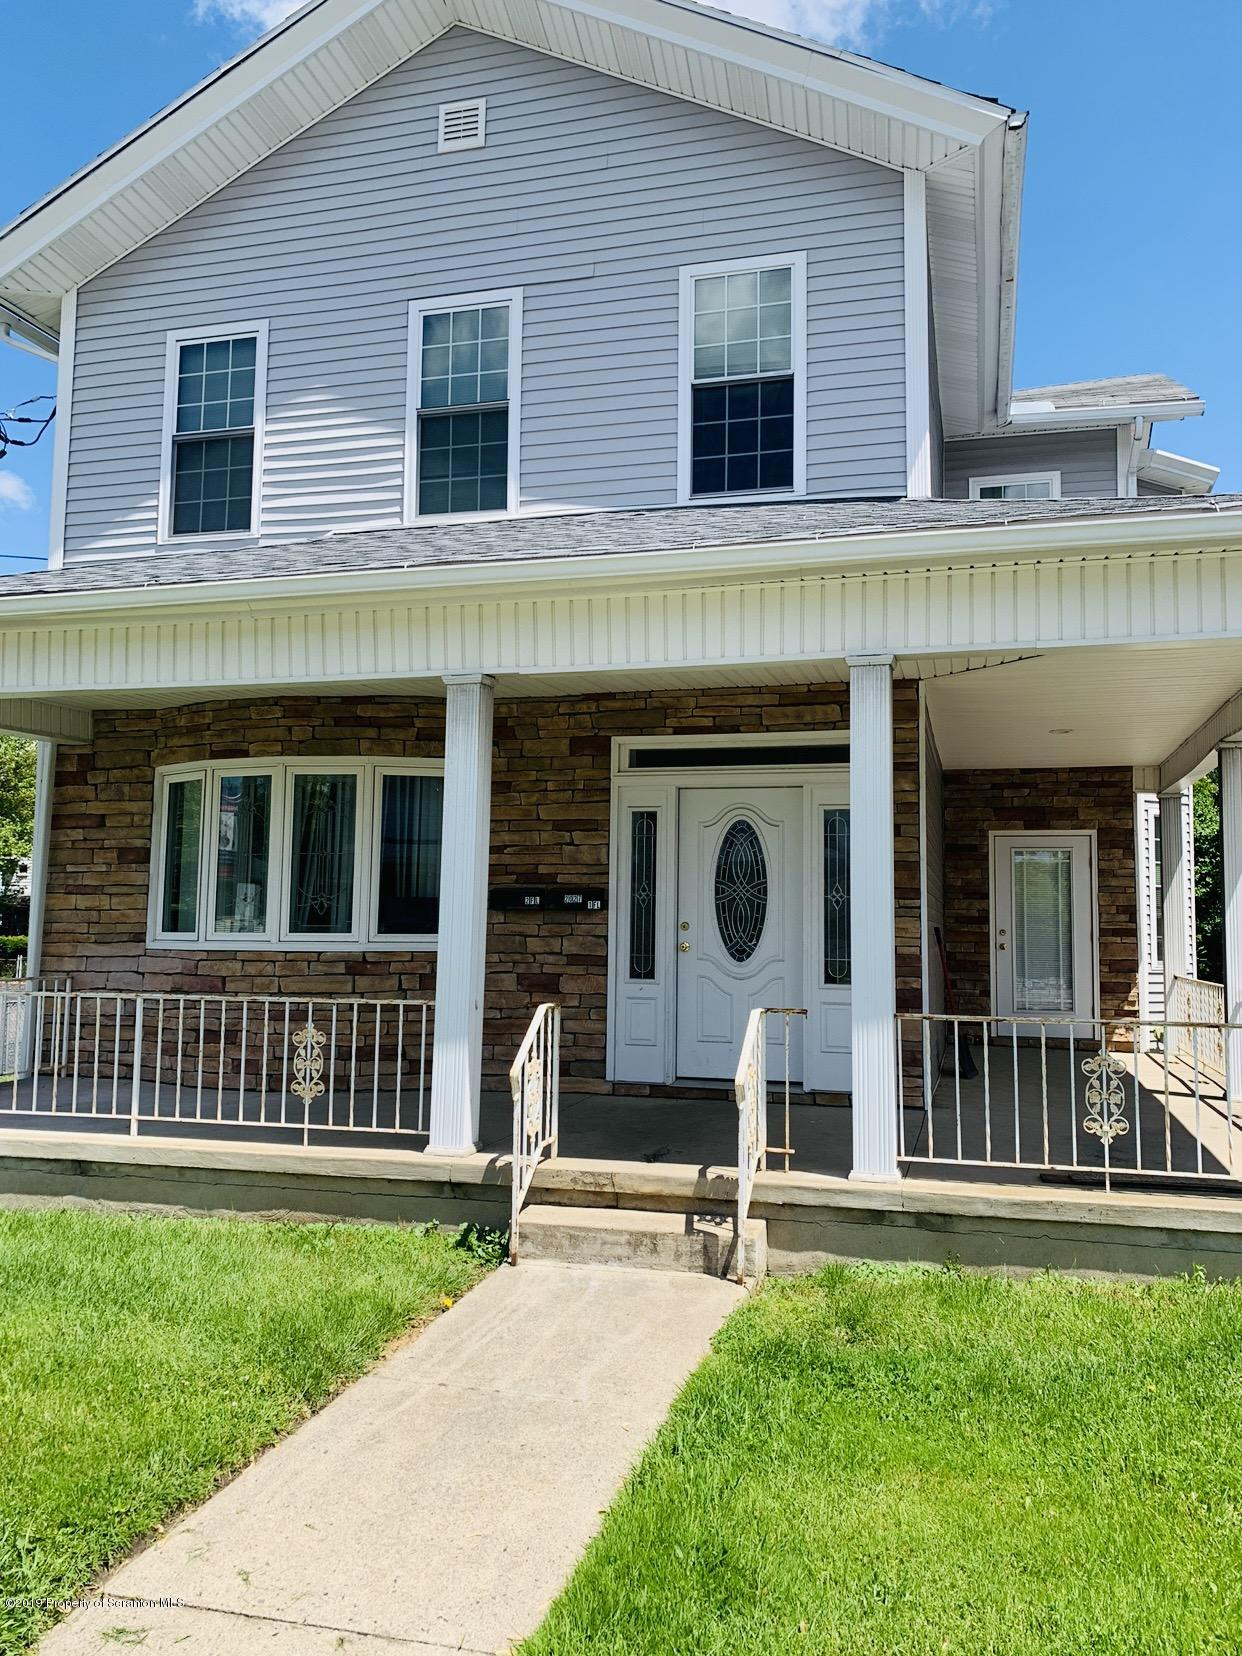 2027 Green Ridge St, Dunmore, Pennsylvania 18512, 4 Bedrooms Bedrooms, 5 Rooms Rooms,1 BathroomBathrooms,Rental,For Lease,Green Ridge,19-2446